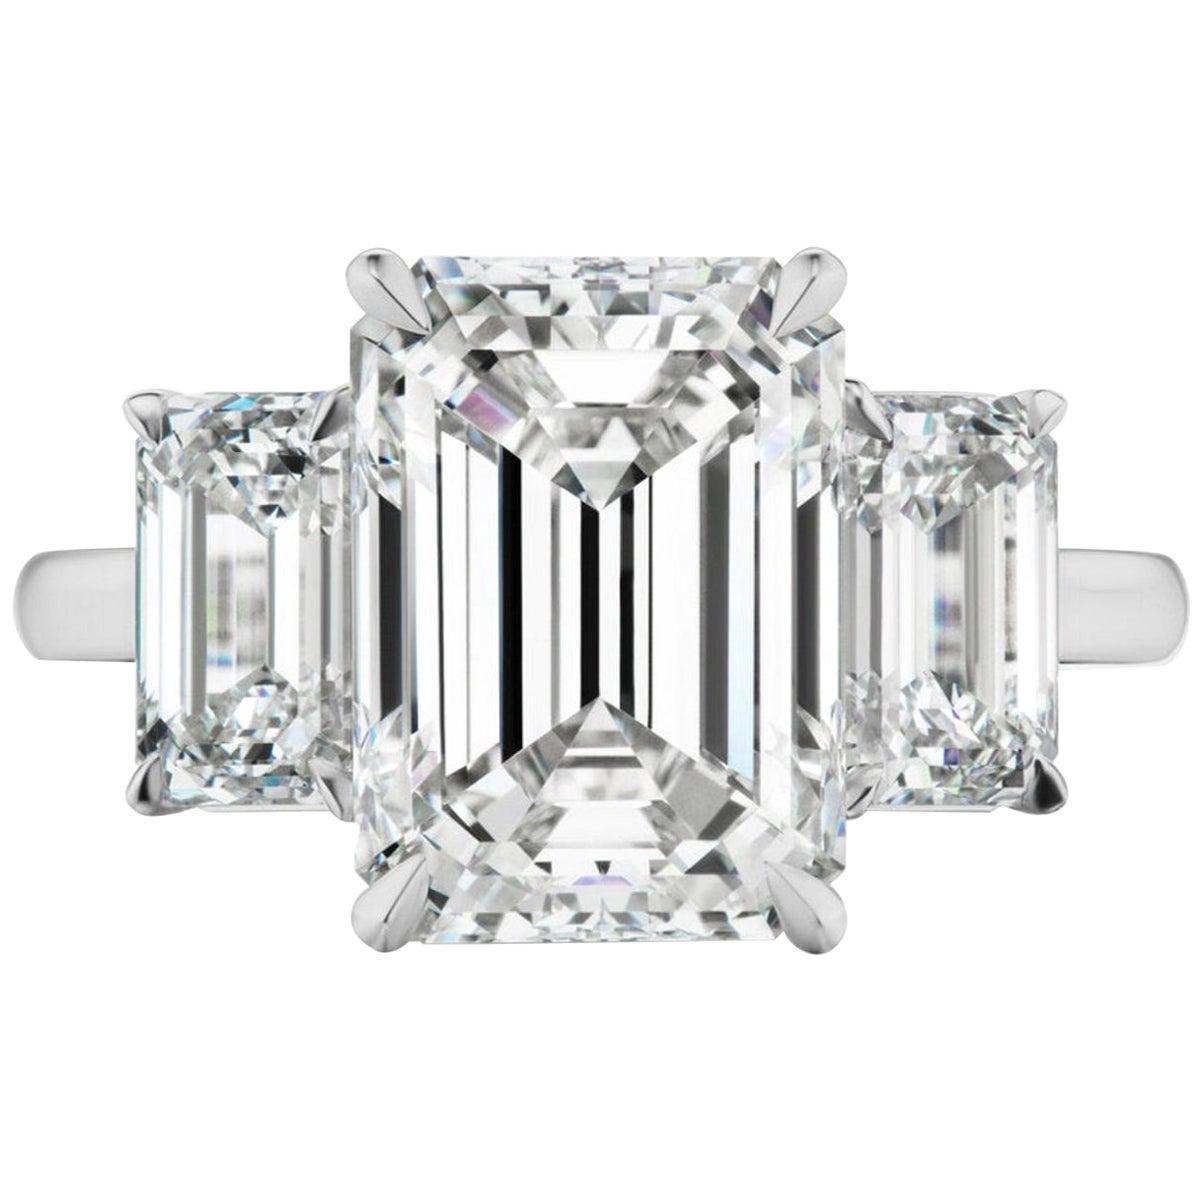 GIA Certified 5.60 Carat Emerald Cut Diamond Engagement Ring